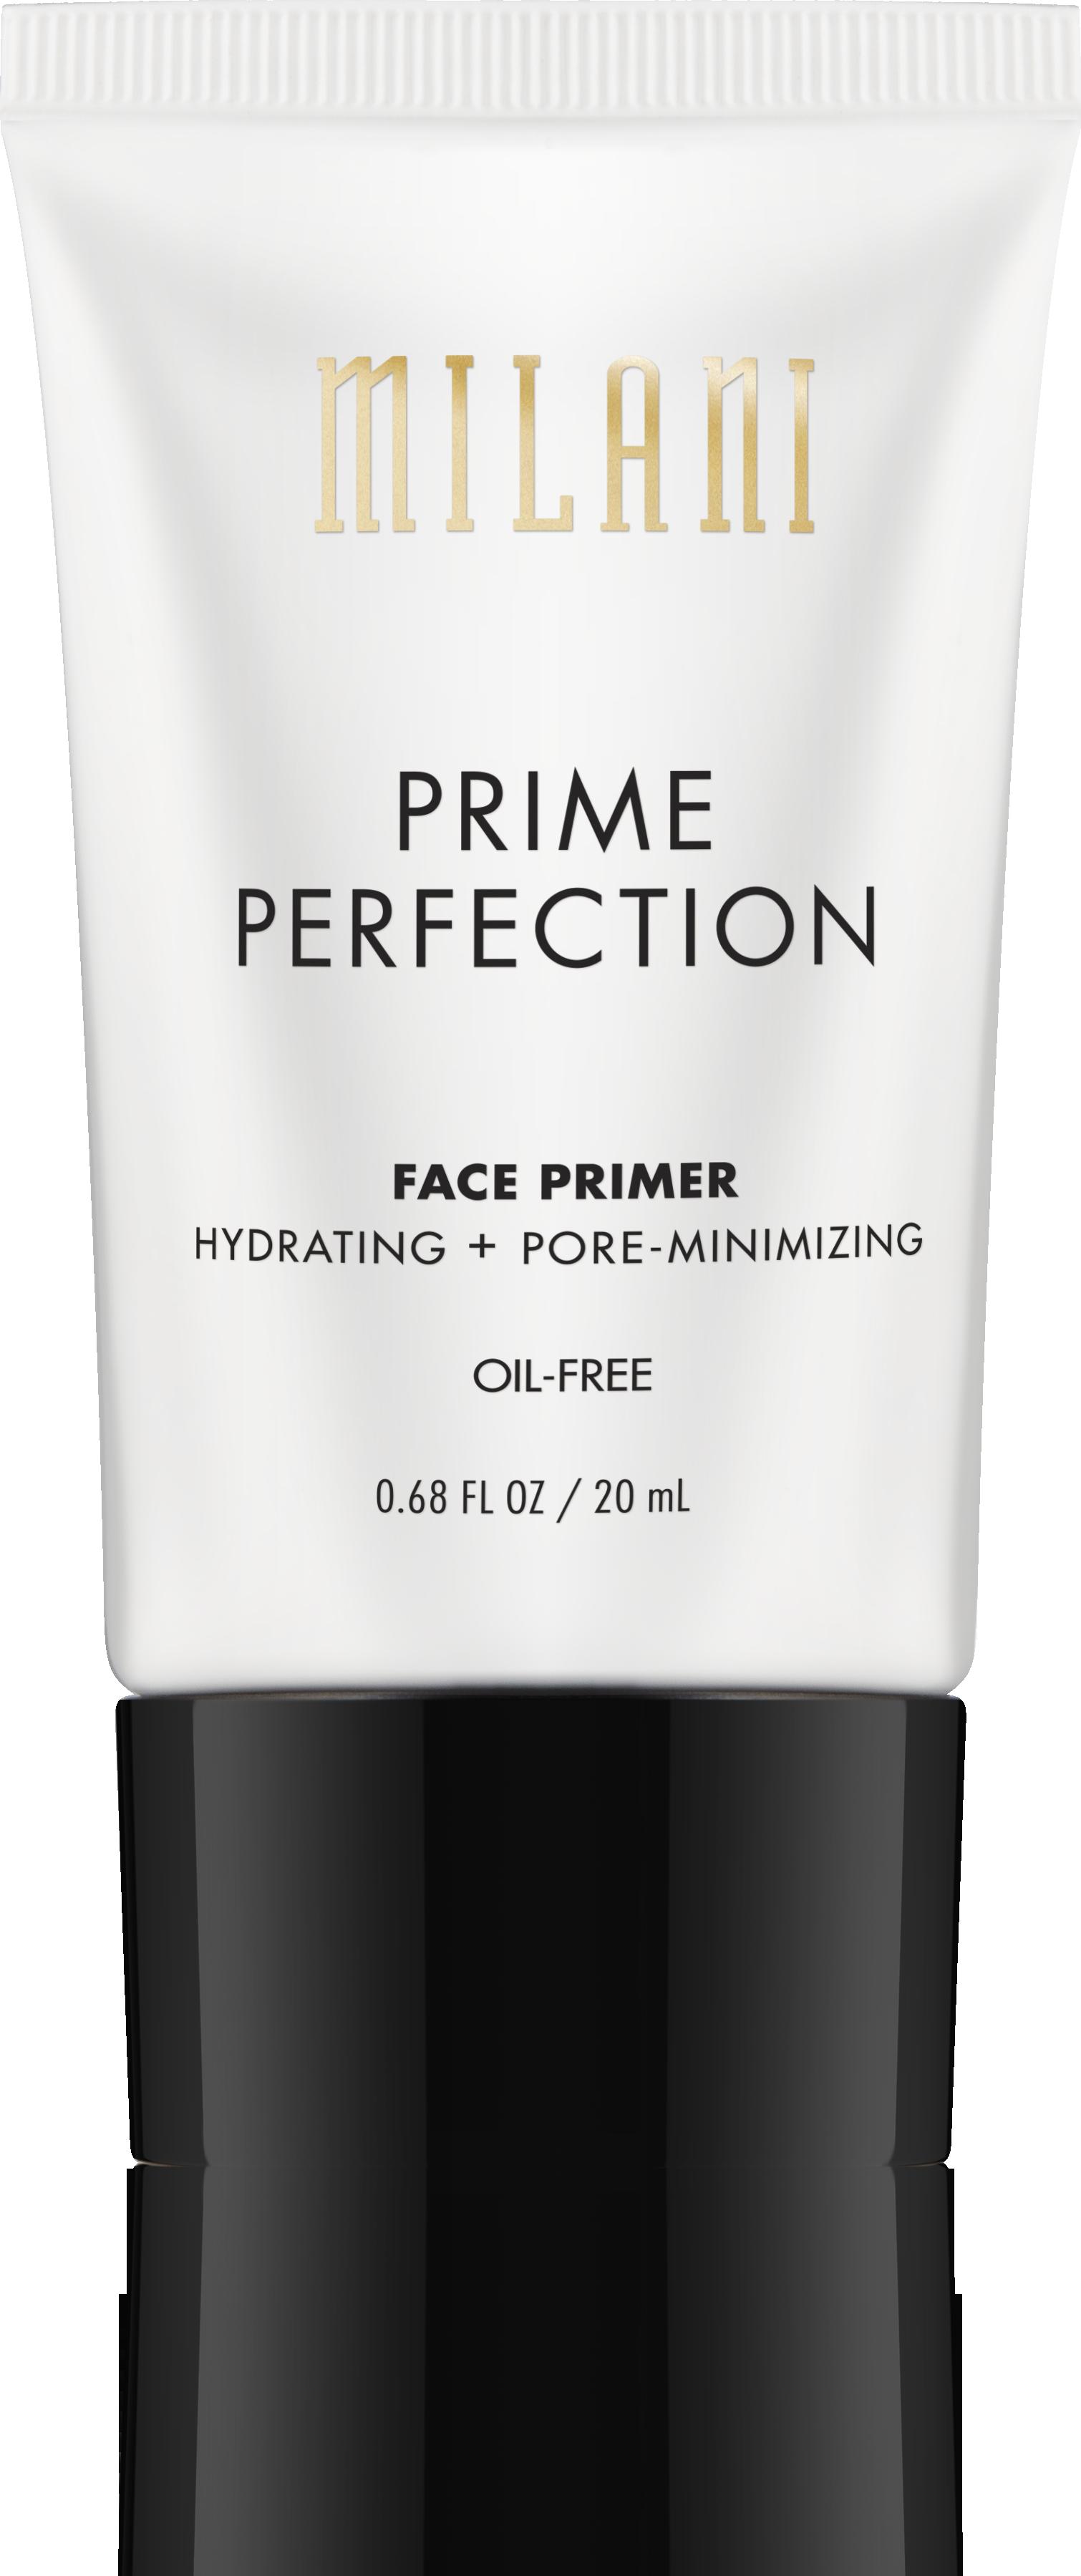 Prime Perfection Hydrating + Pore-Minimizing Face Primer from Milani